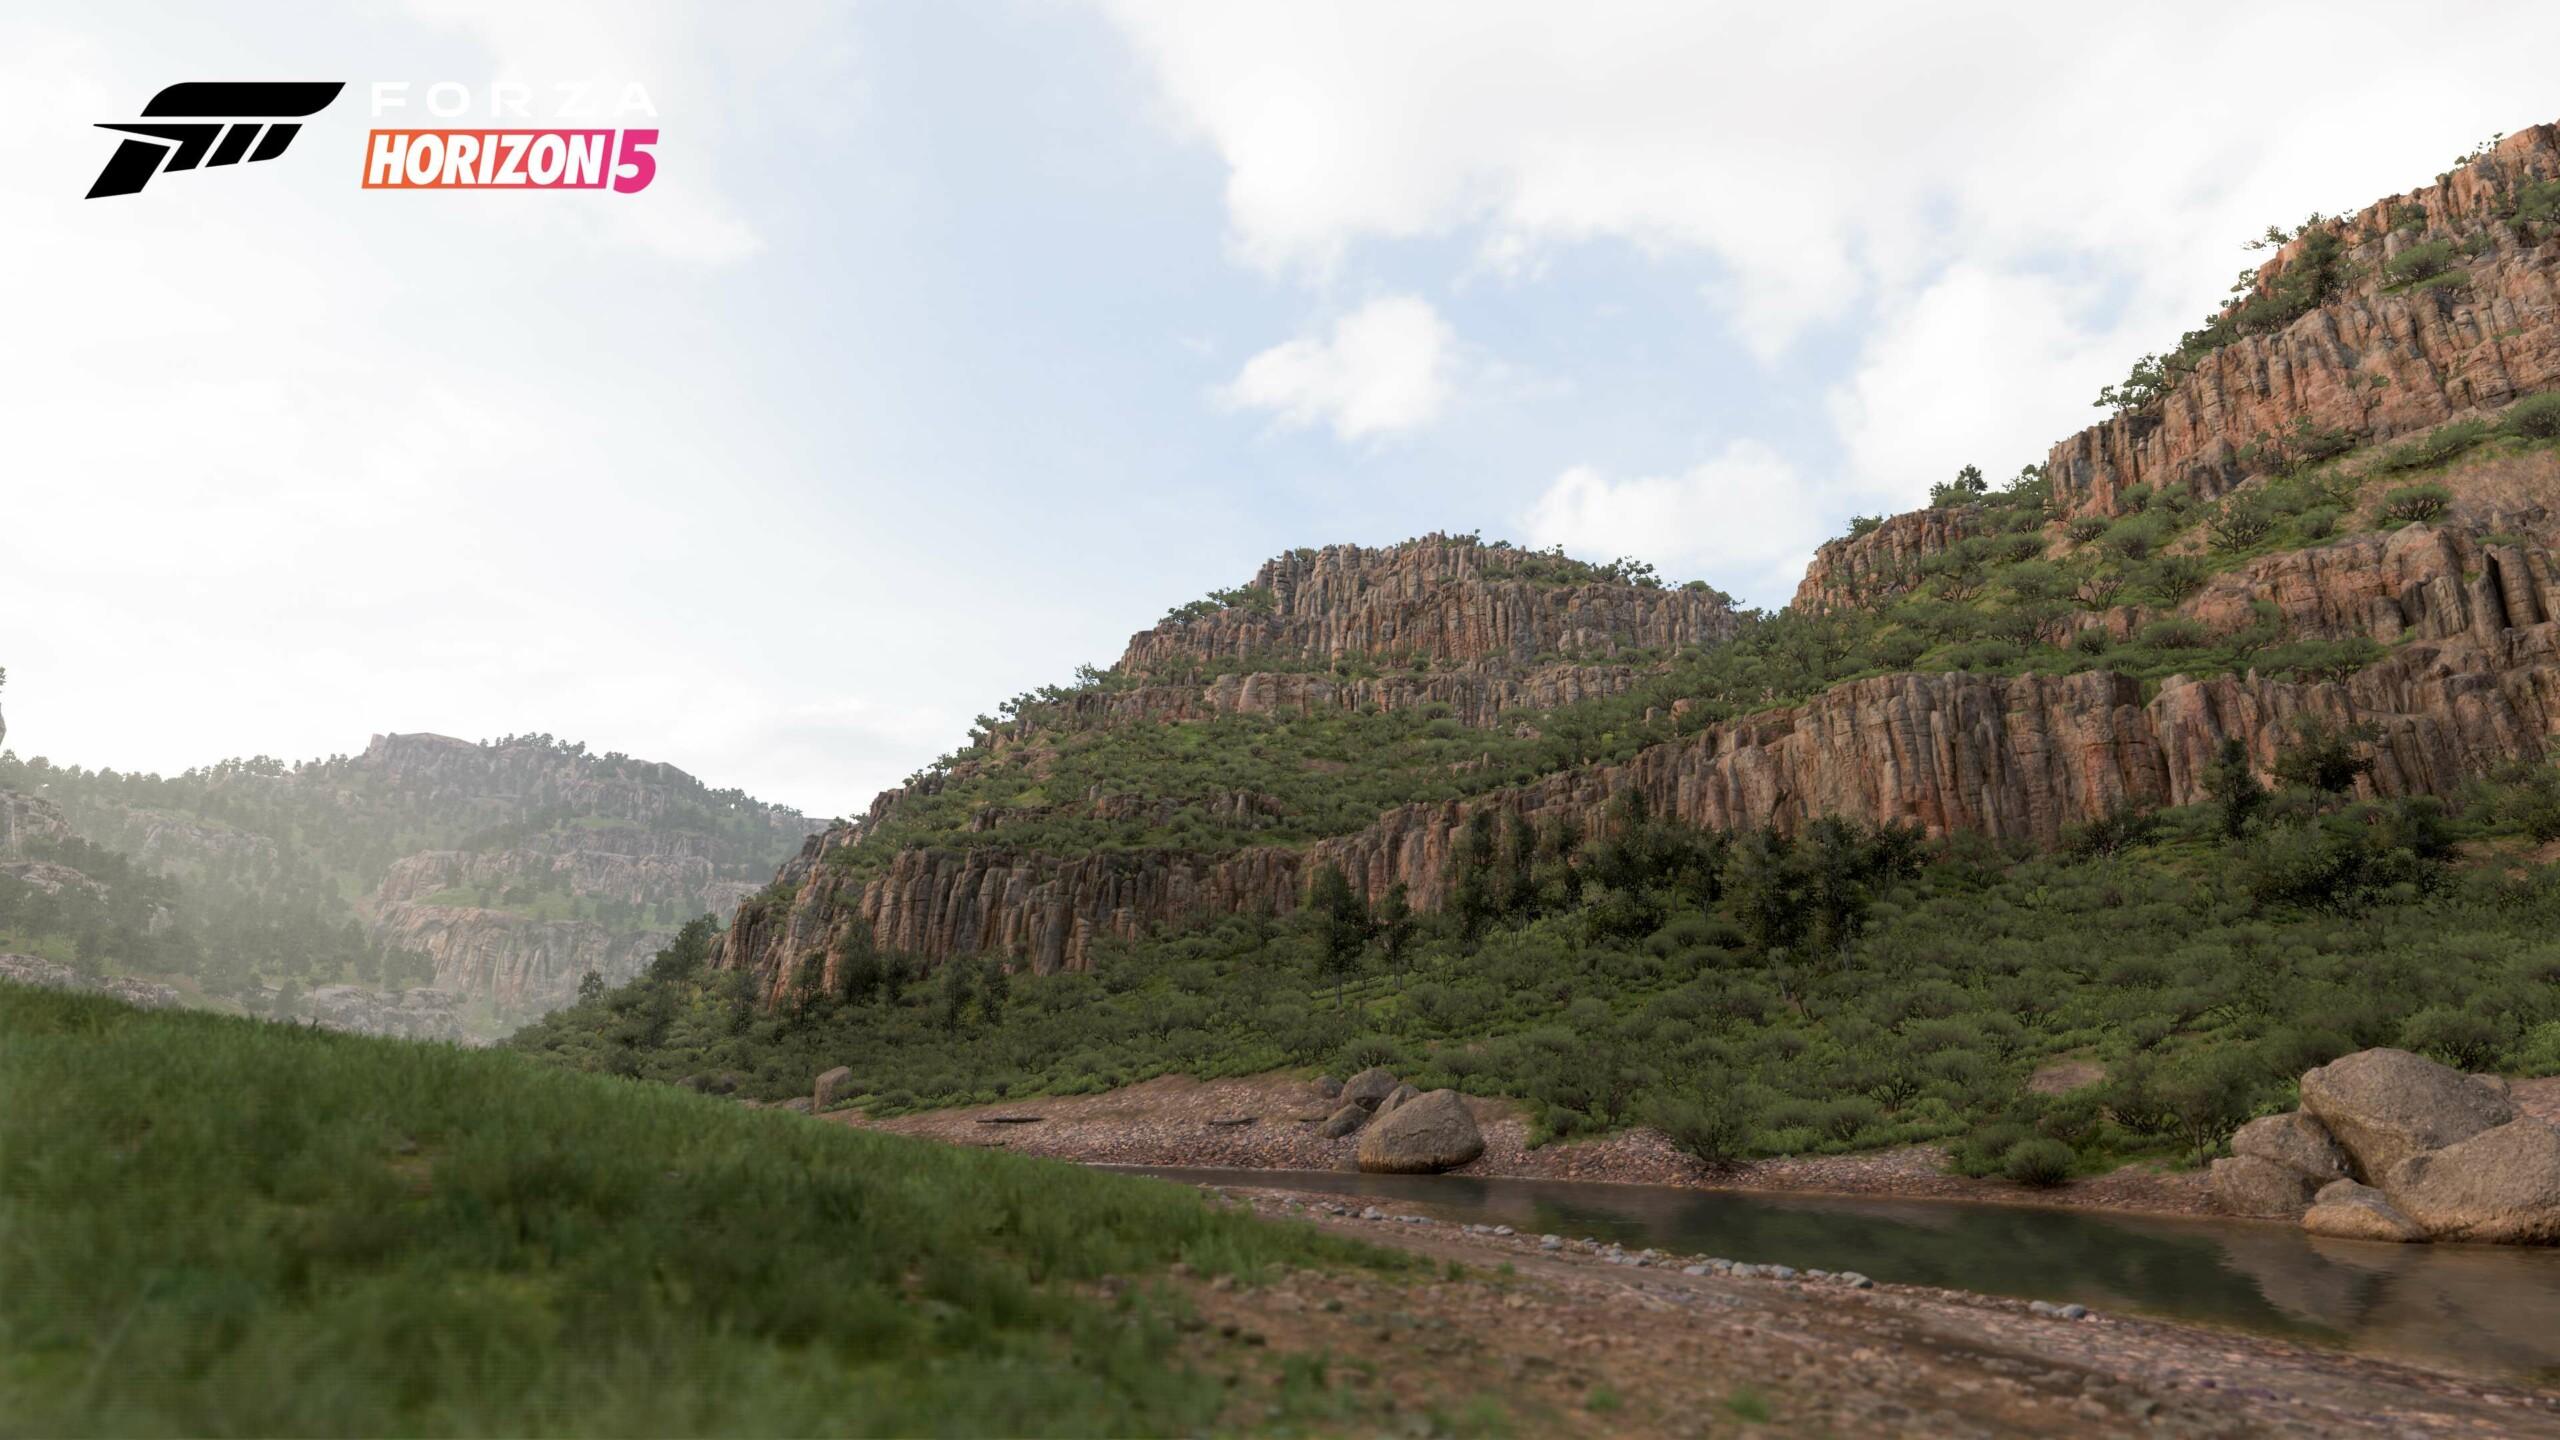 Alpha Point UE5, Forza Horizon 5, Flight Simulator : Xbox enchaîne les claques graphiques